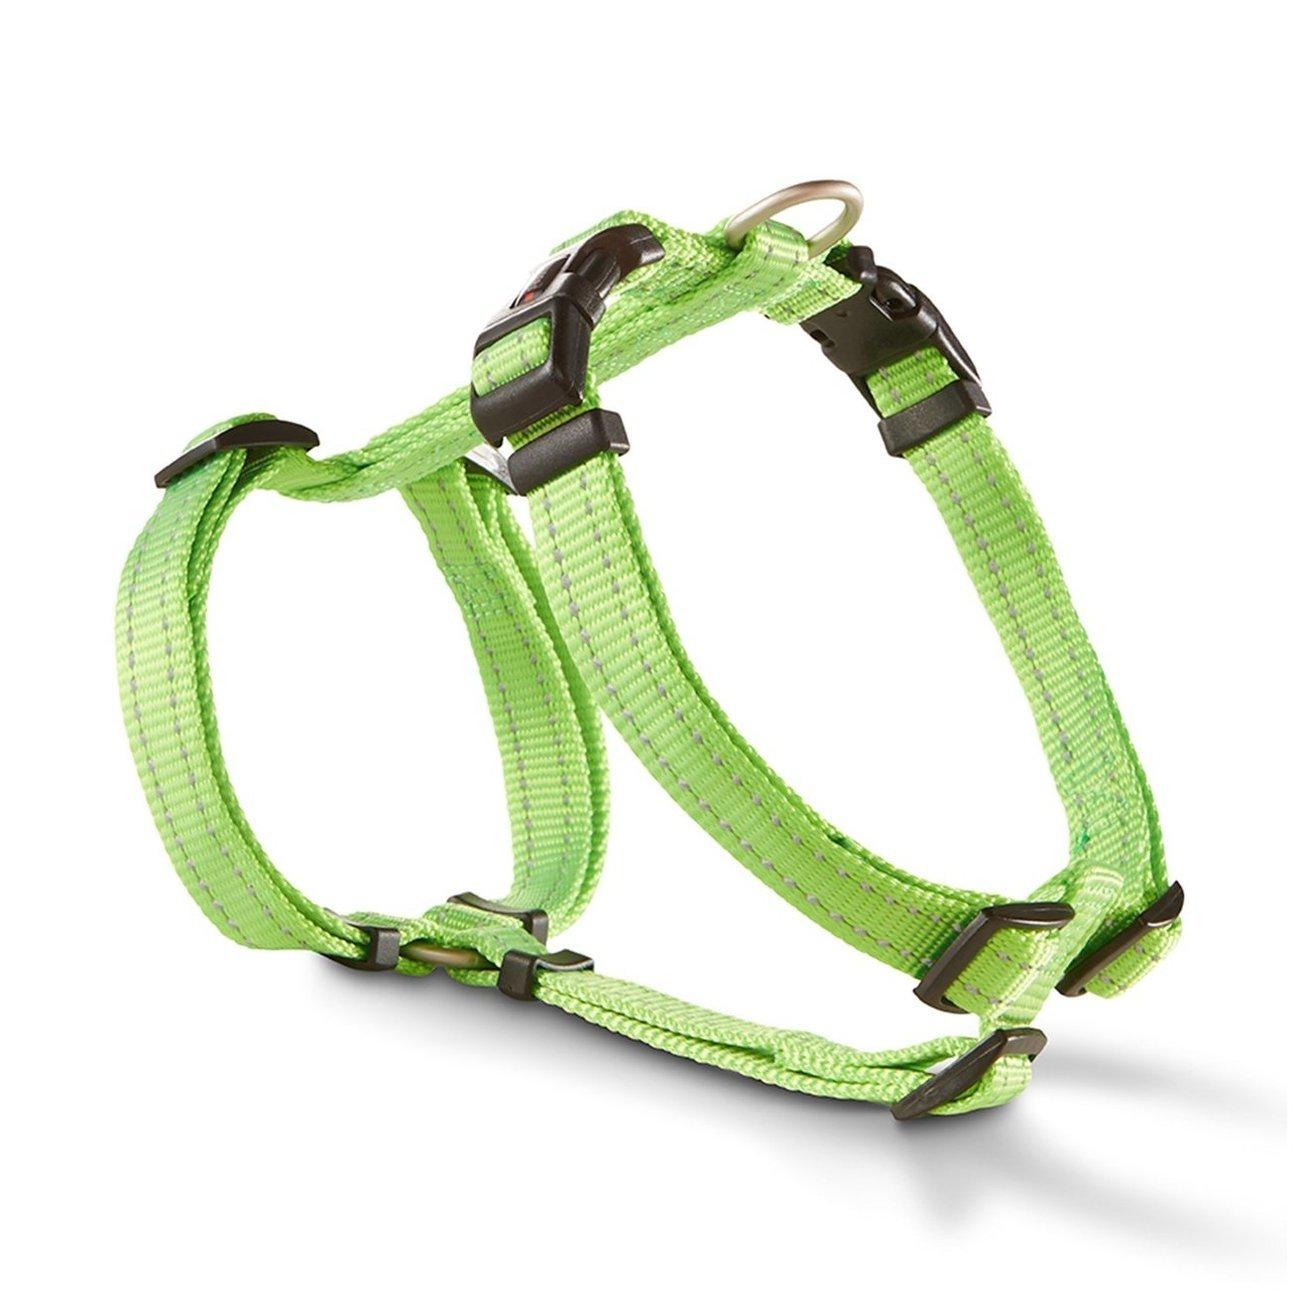 Wolters Hundegeschirr Soft & Safe Professional, Bild 3